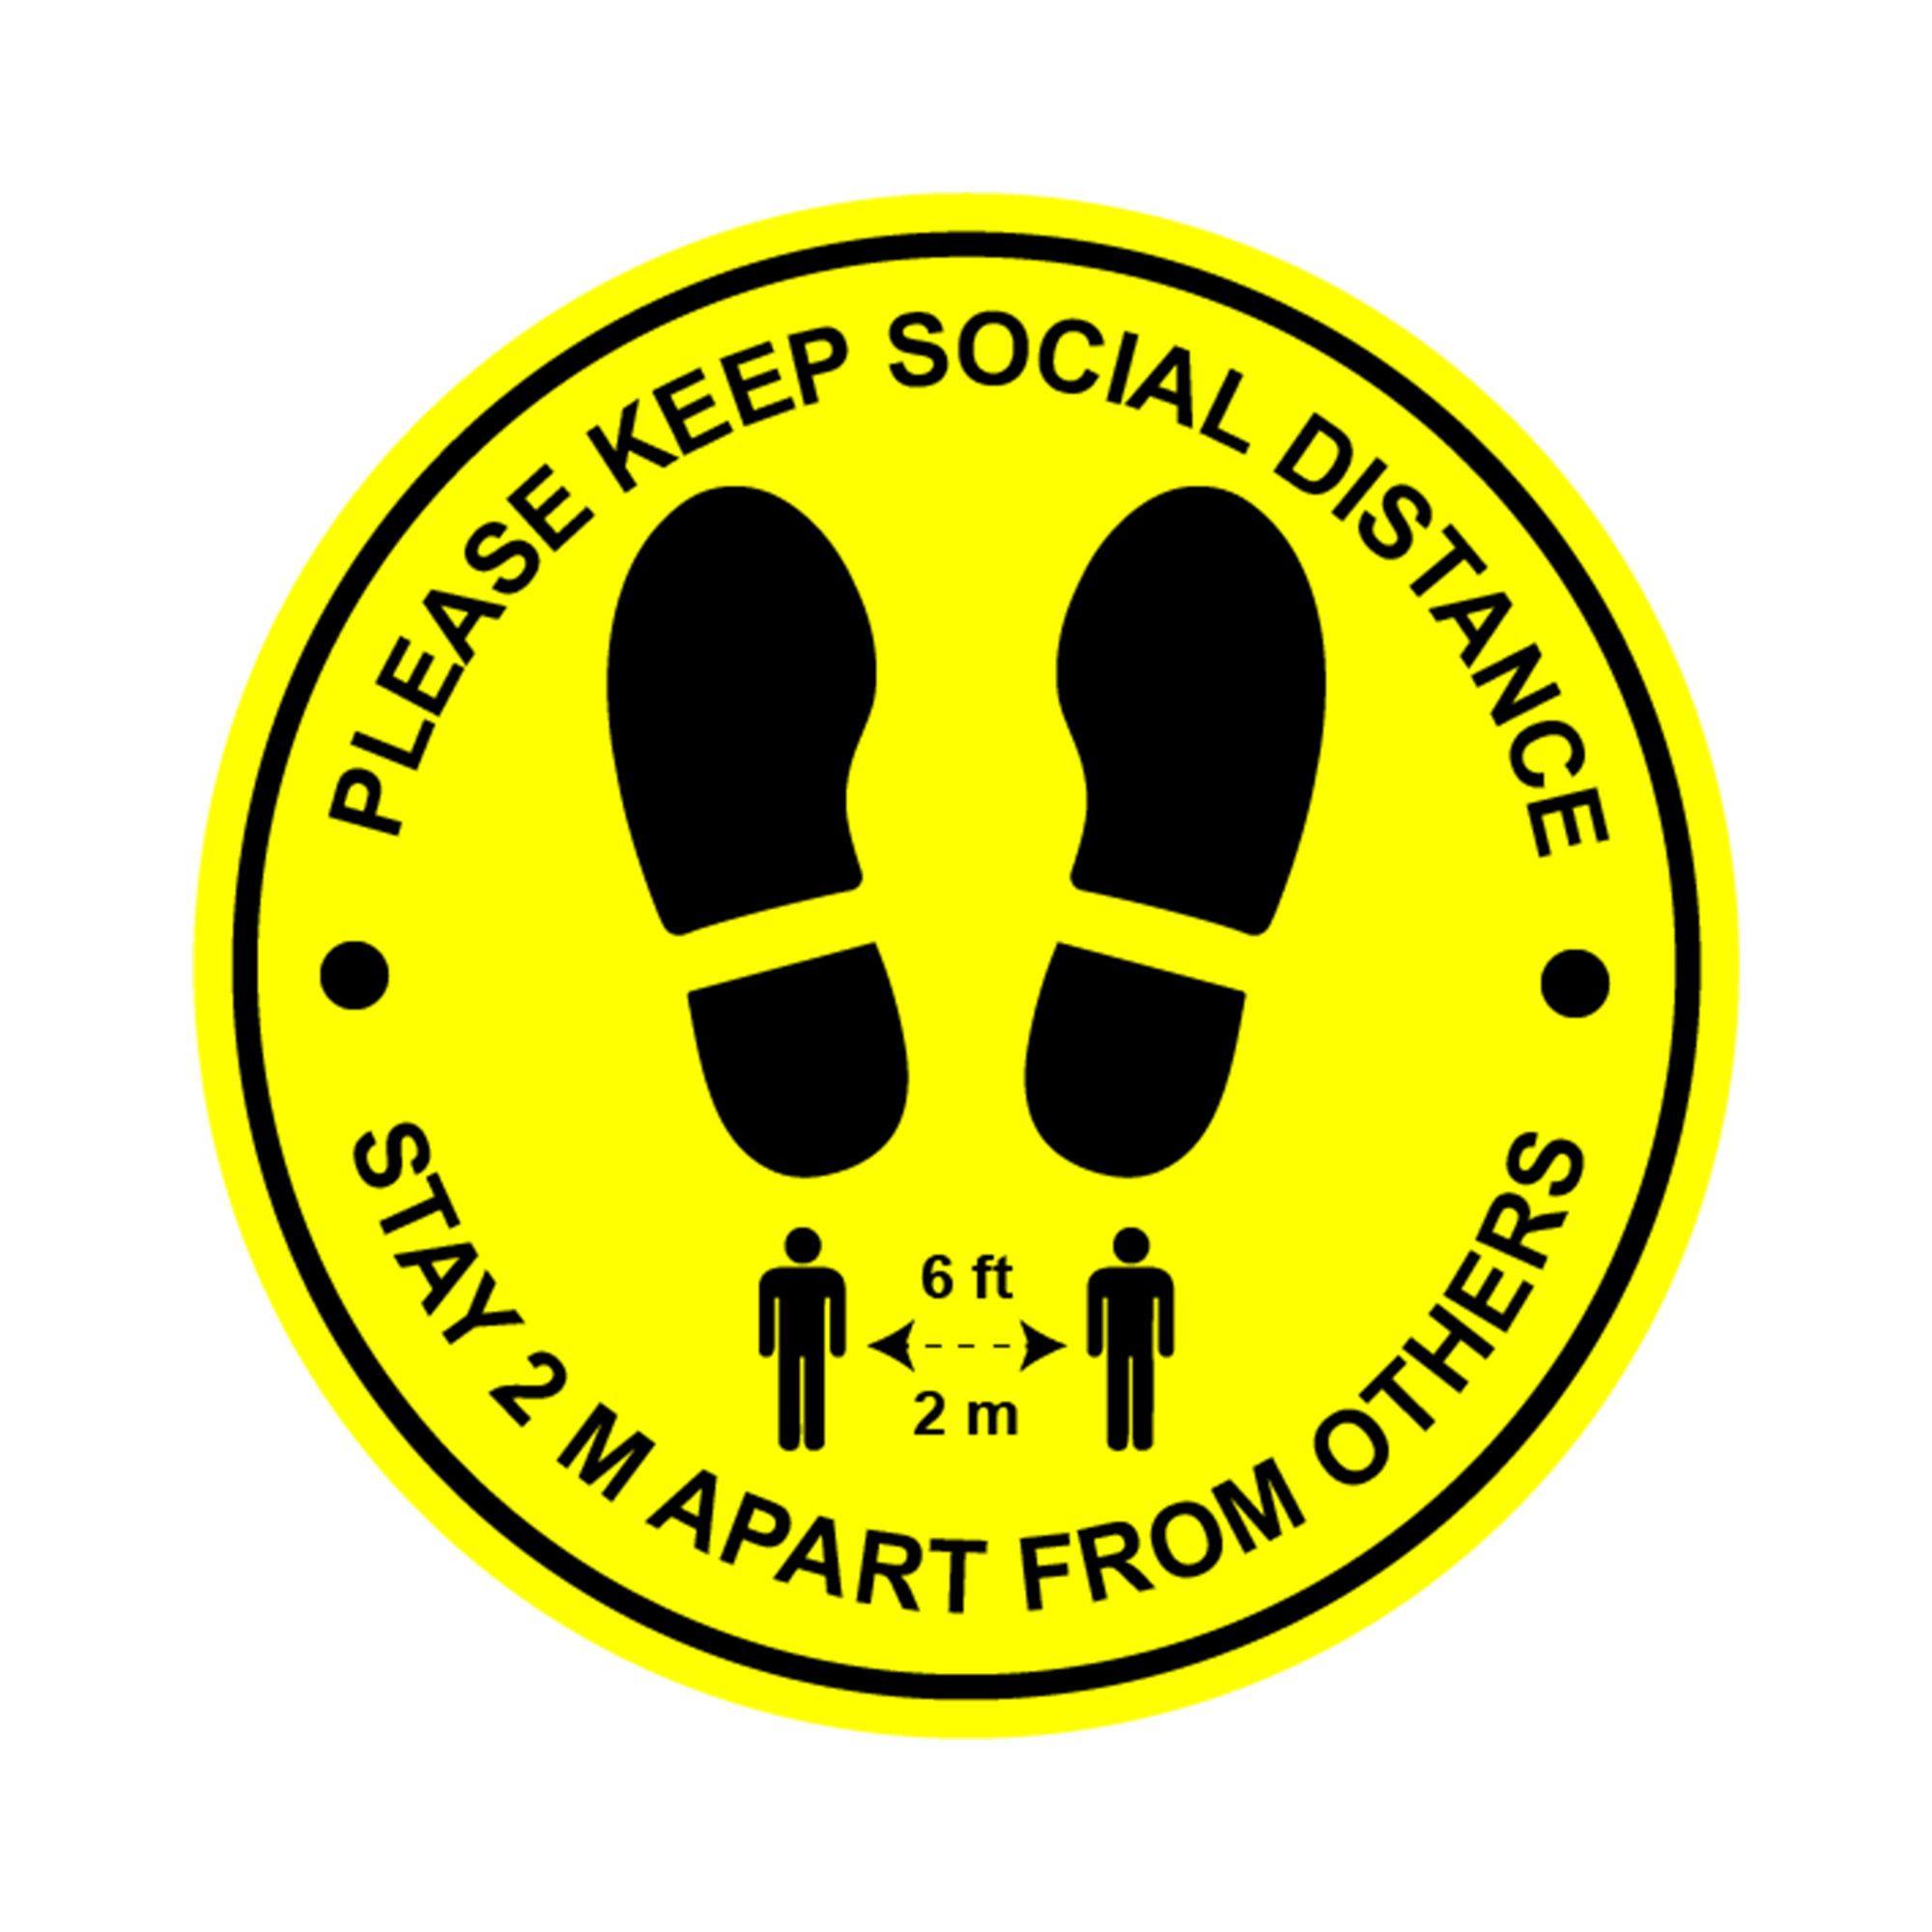 Social distance floor decals Social distance stickers